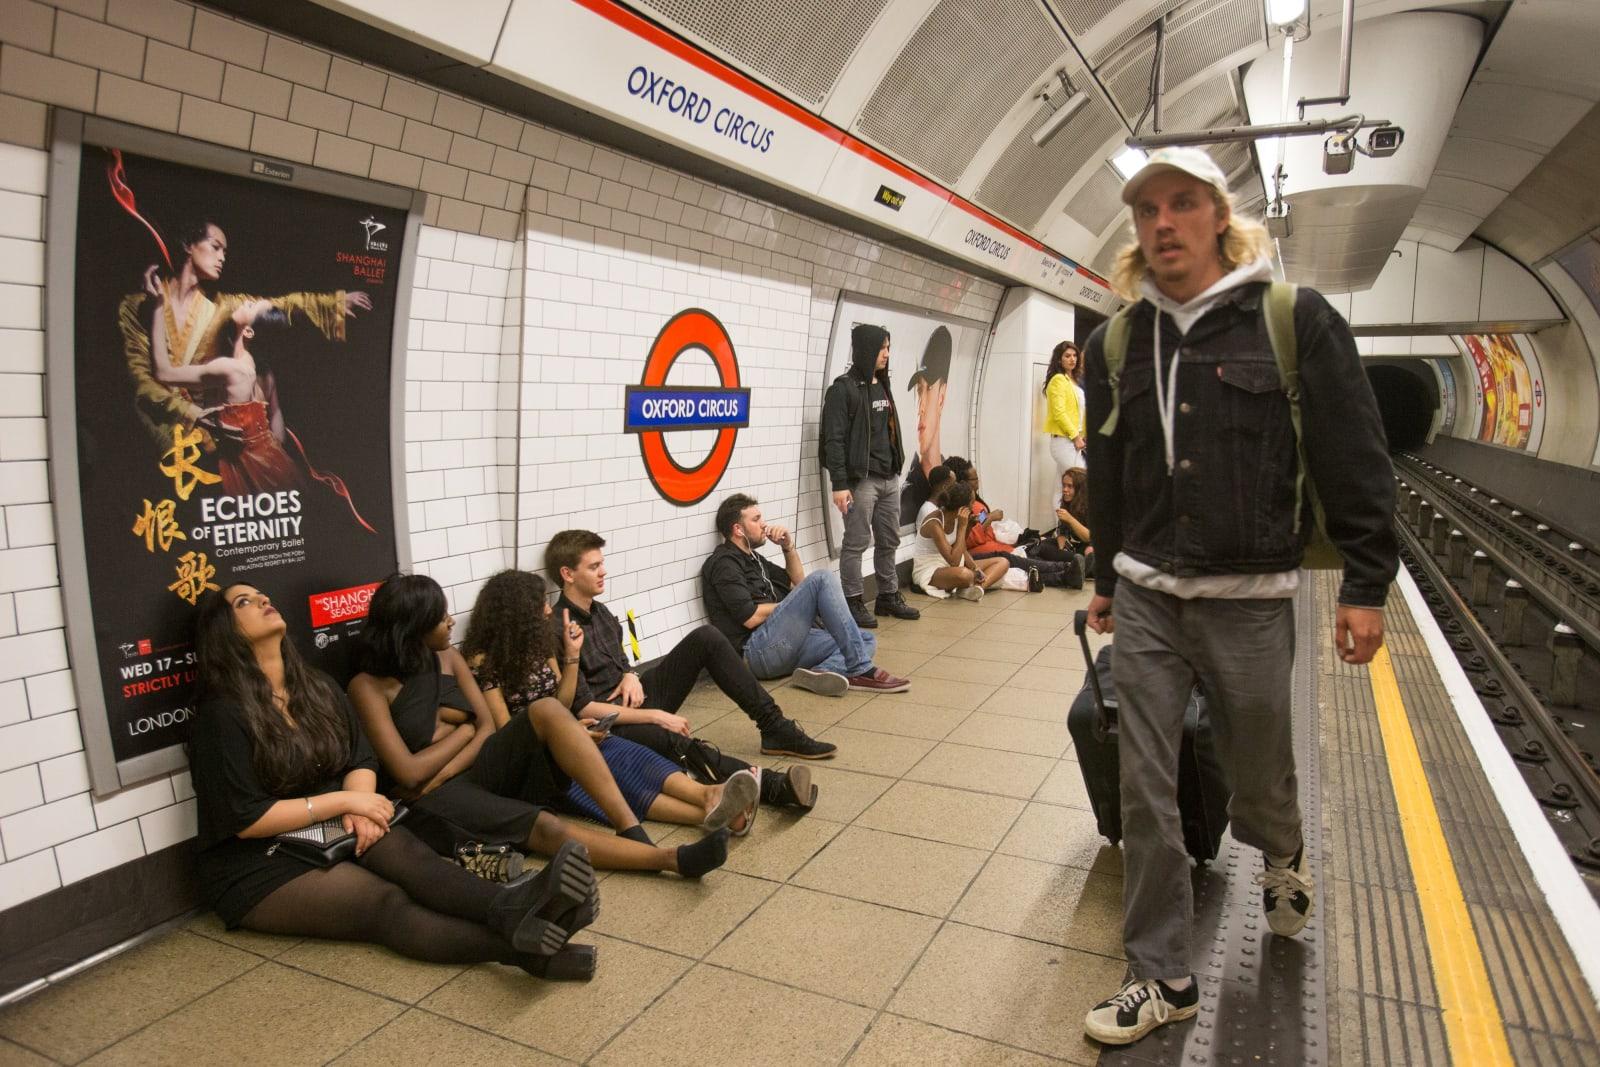 TfL thinks tracking passenger phones will improve the Tube